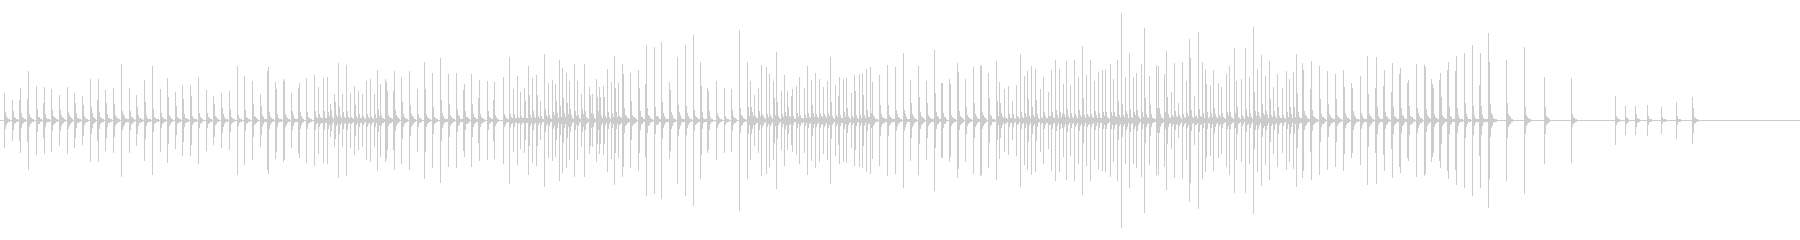 木琴14歌舞伎黒御簾下座音楽和風日本マリの未再生の波形